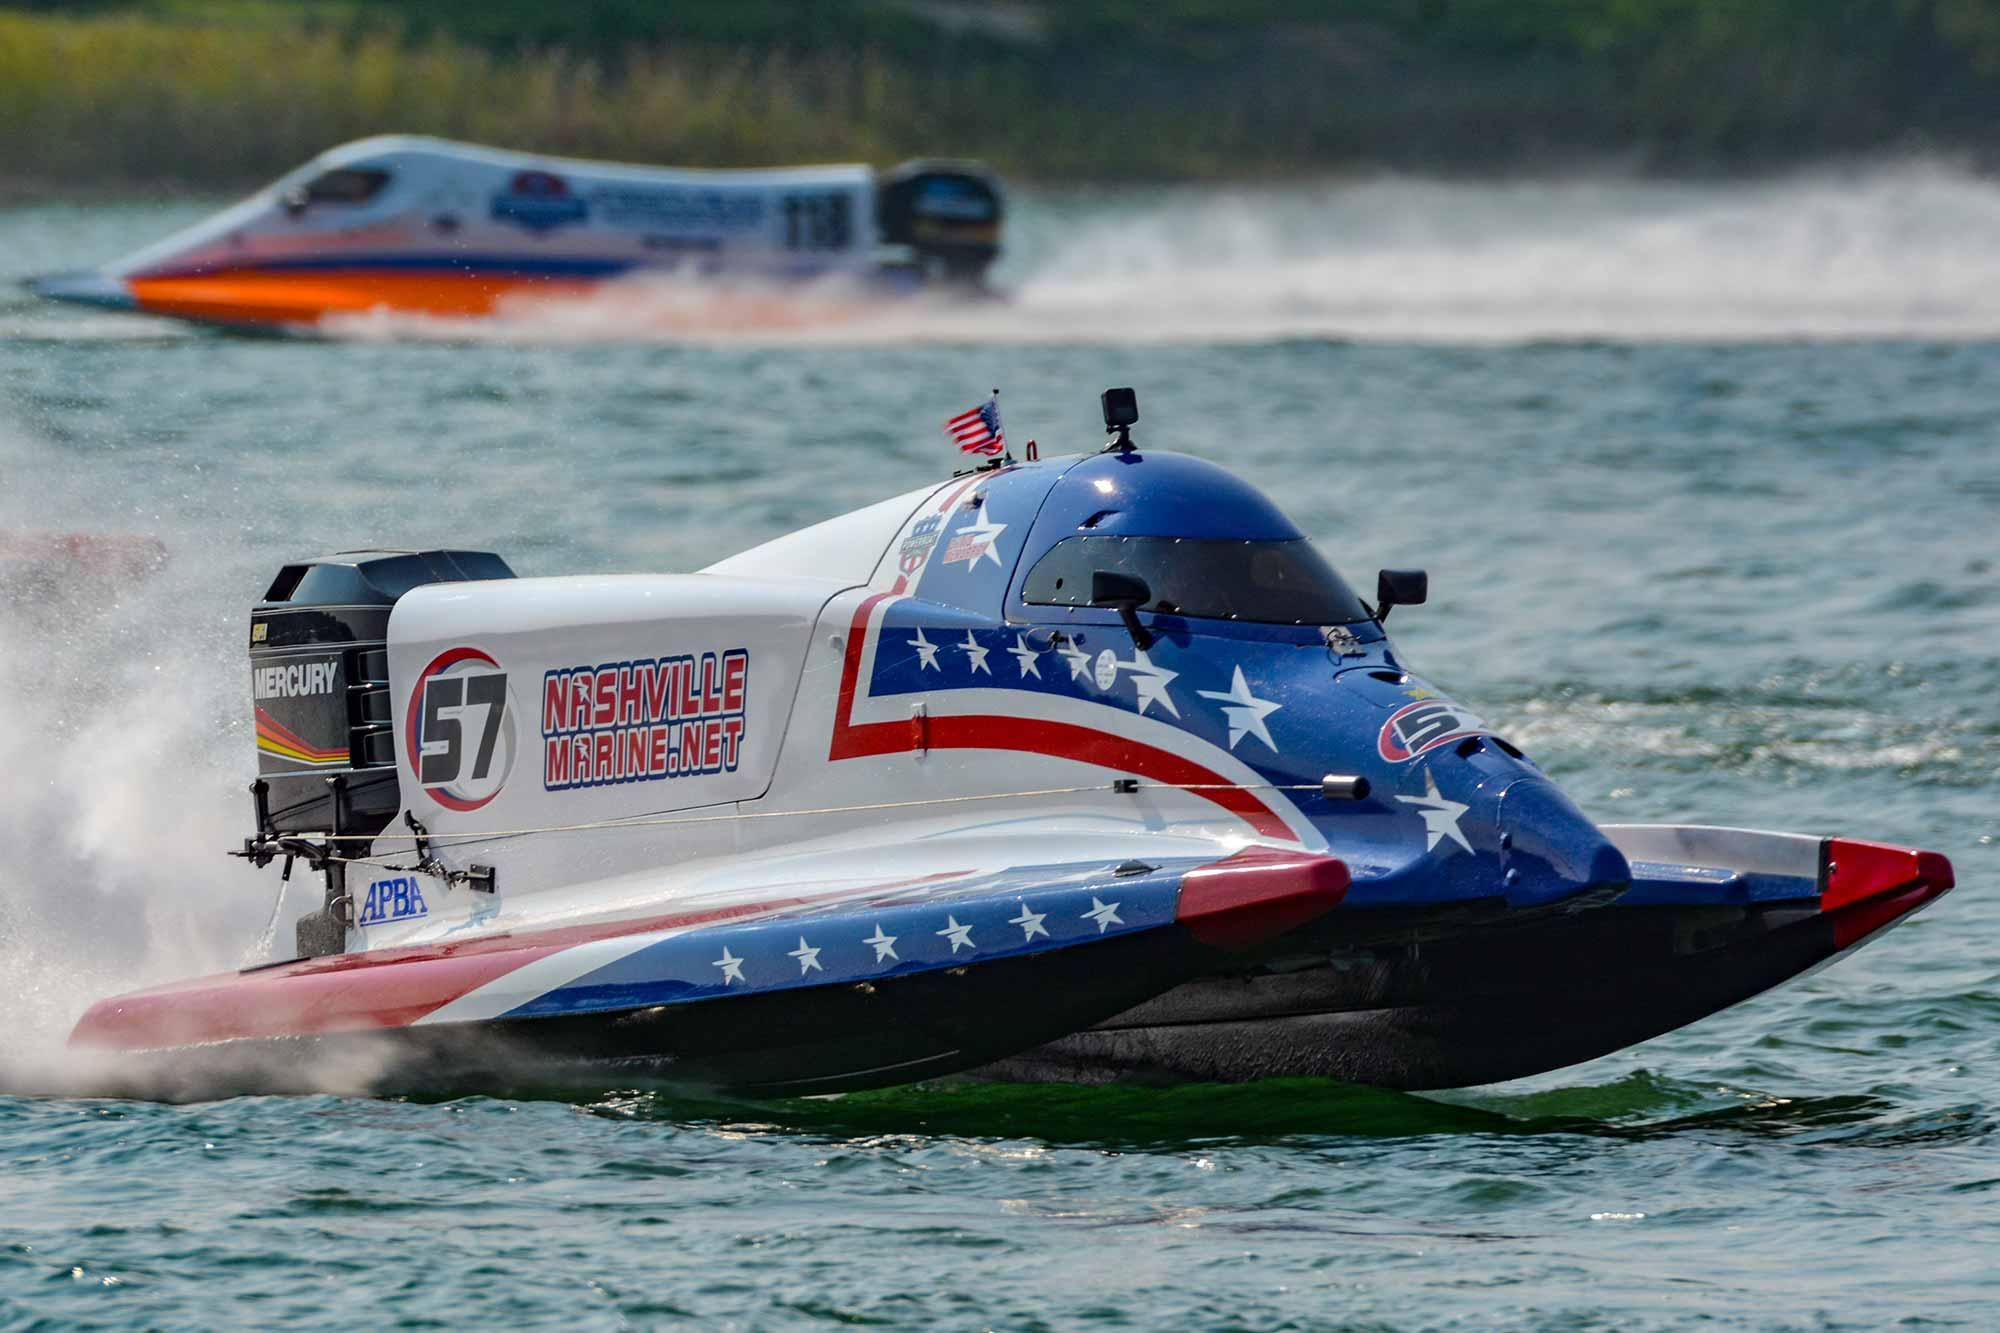 McMurray-Racing-Nashvill-Marine-2021-Springfield-F1-Race-65